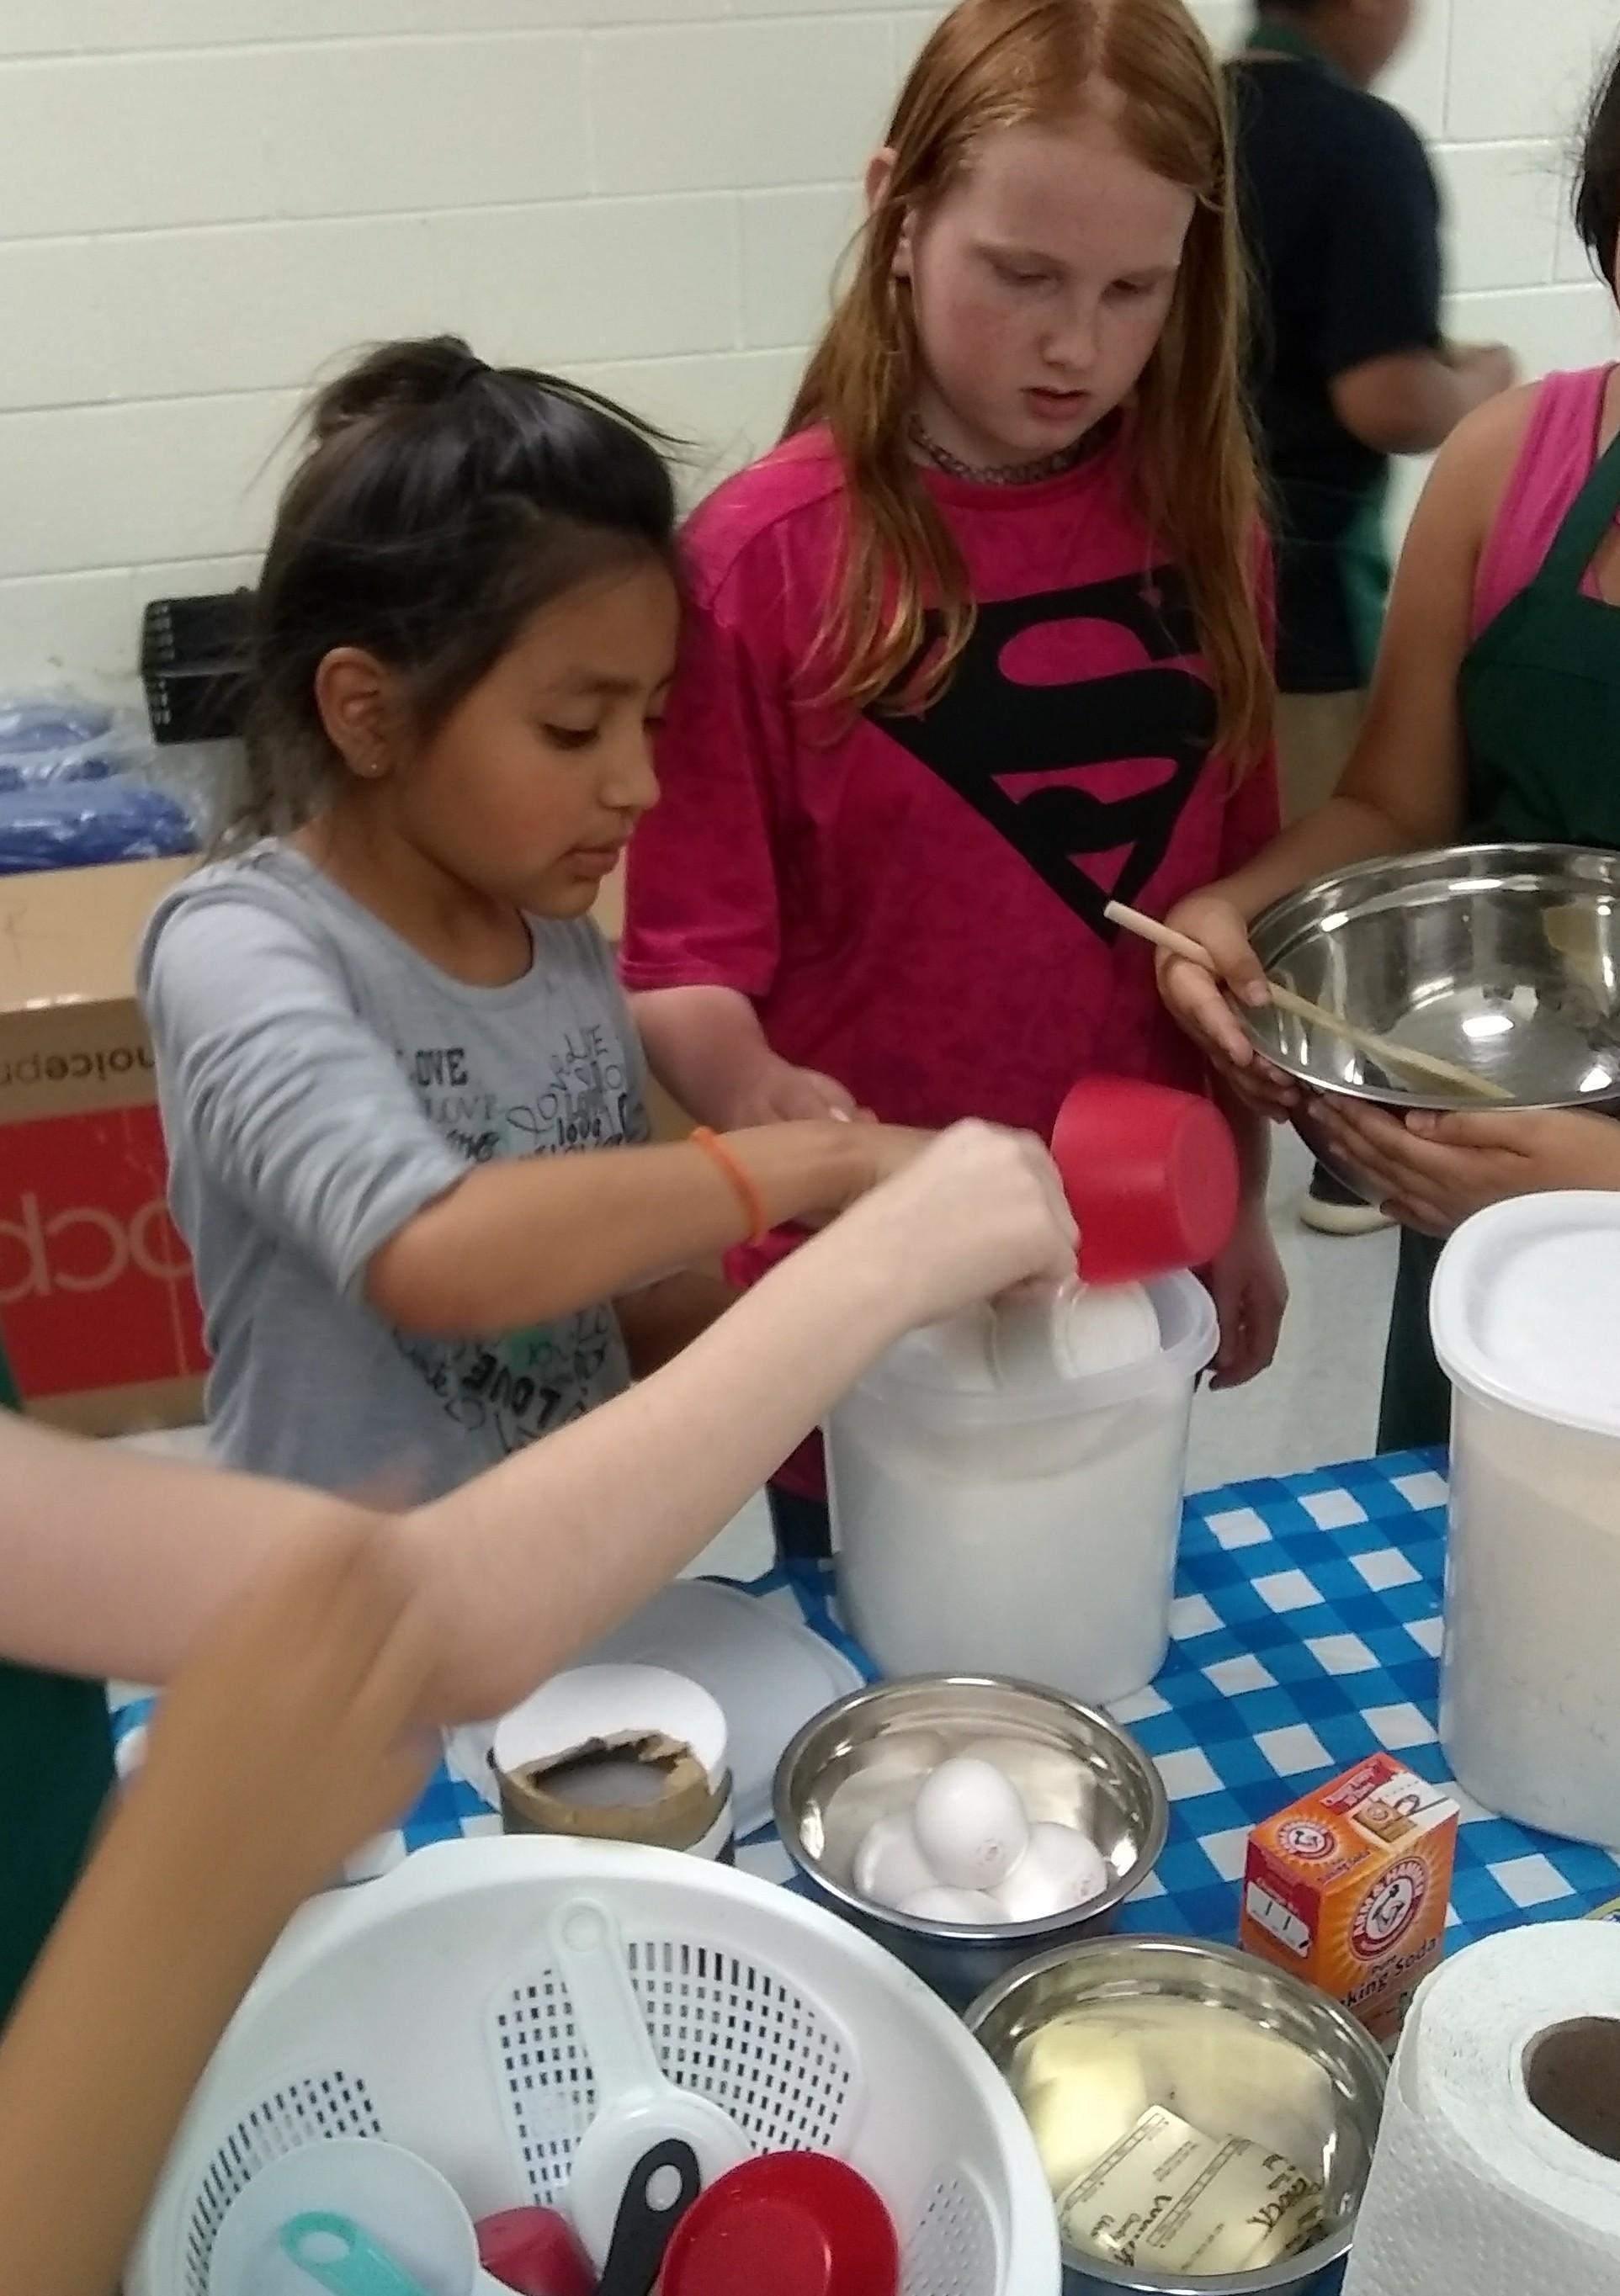 kids preparing banana bread together